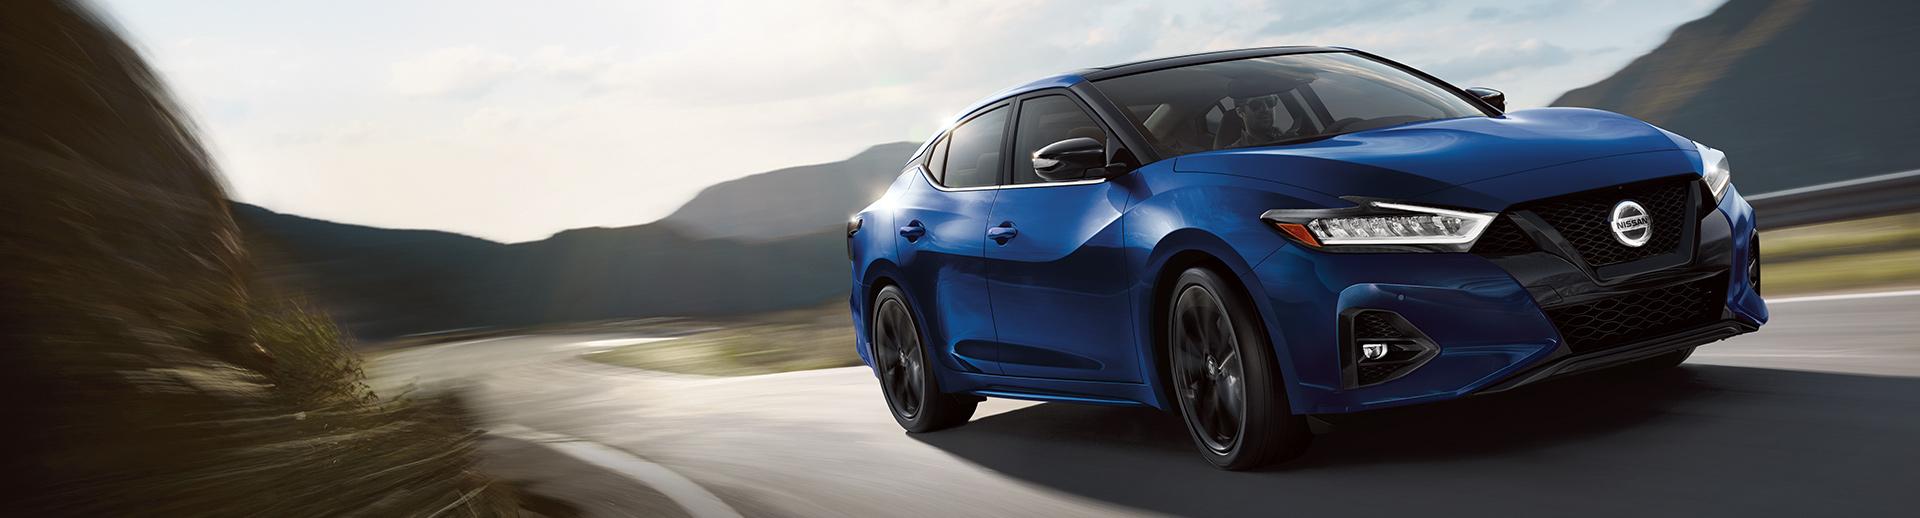 2021 Nissan Maxima Lifestyle Photo